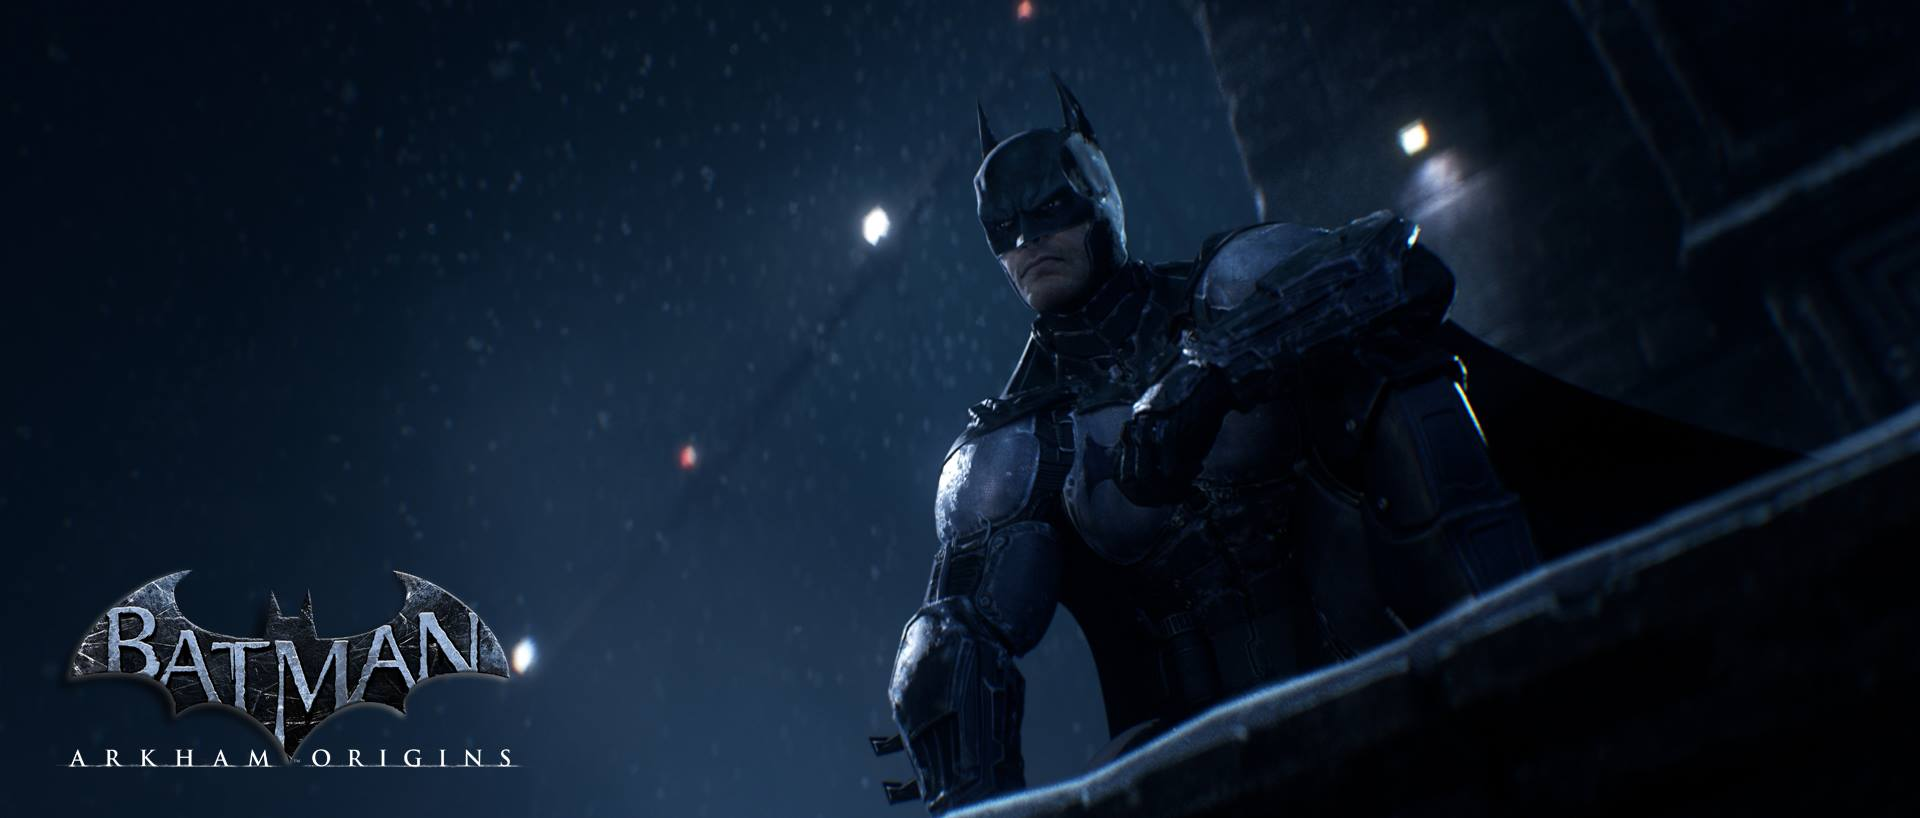 Batman Arkham Origins Wallpapers Best HD Wallapers 1920x818